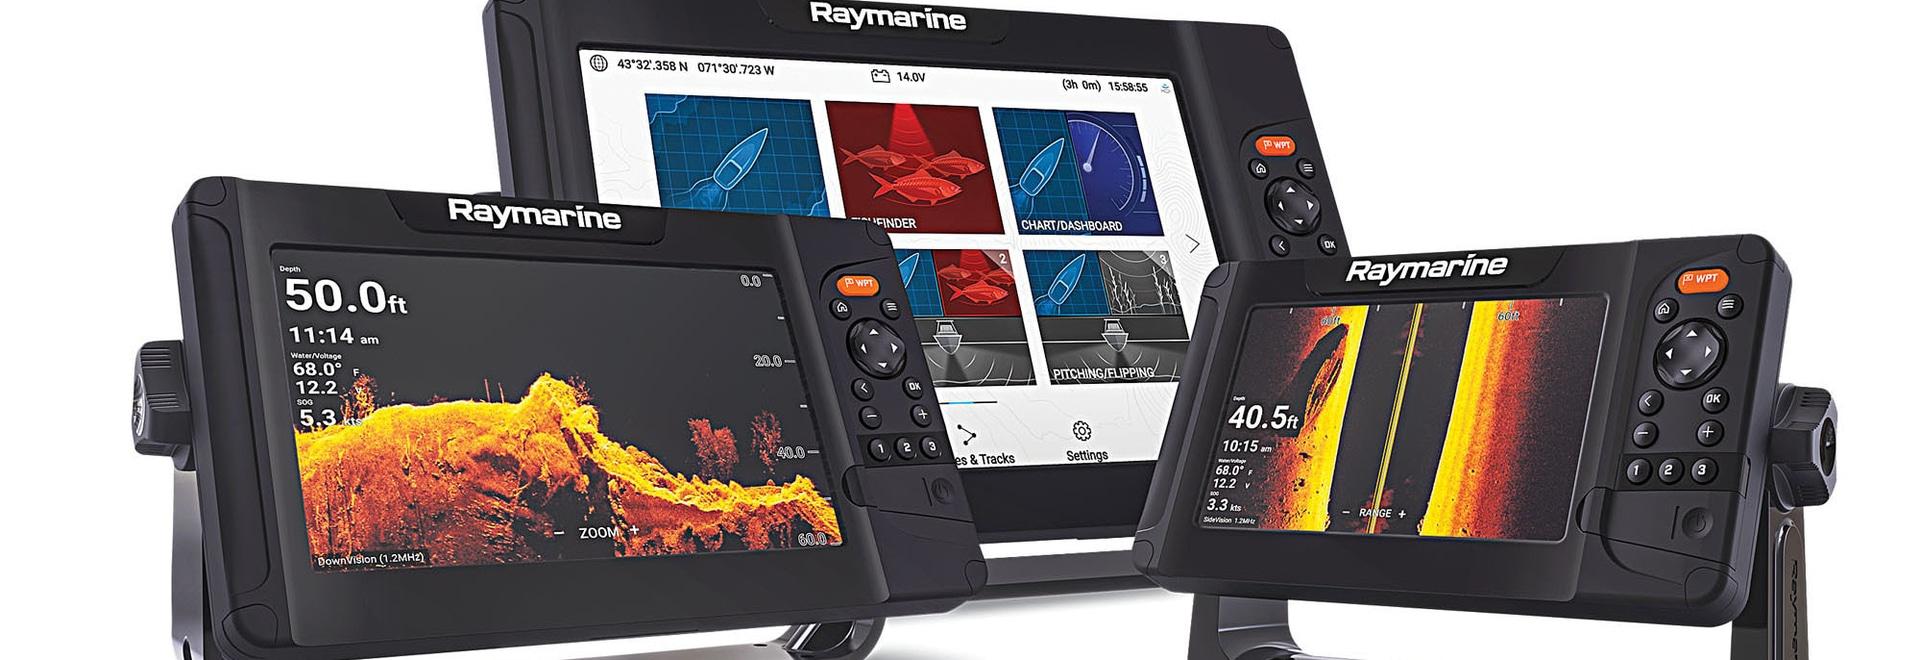 Raymarine Element Sonar-GPS with HyperVision